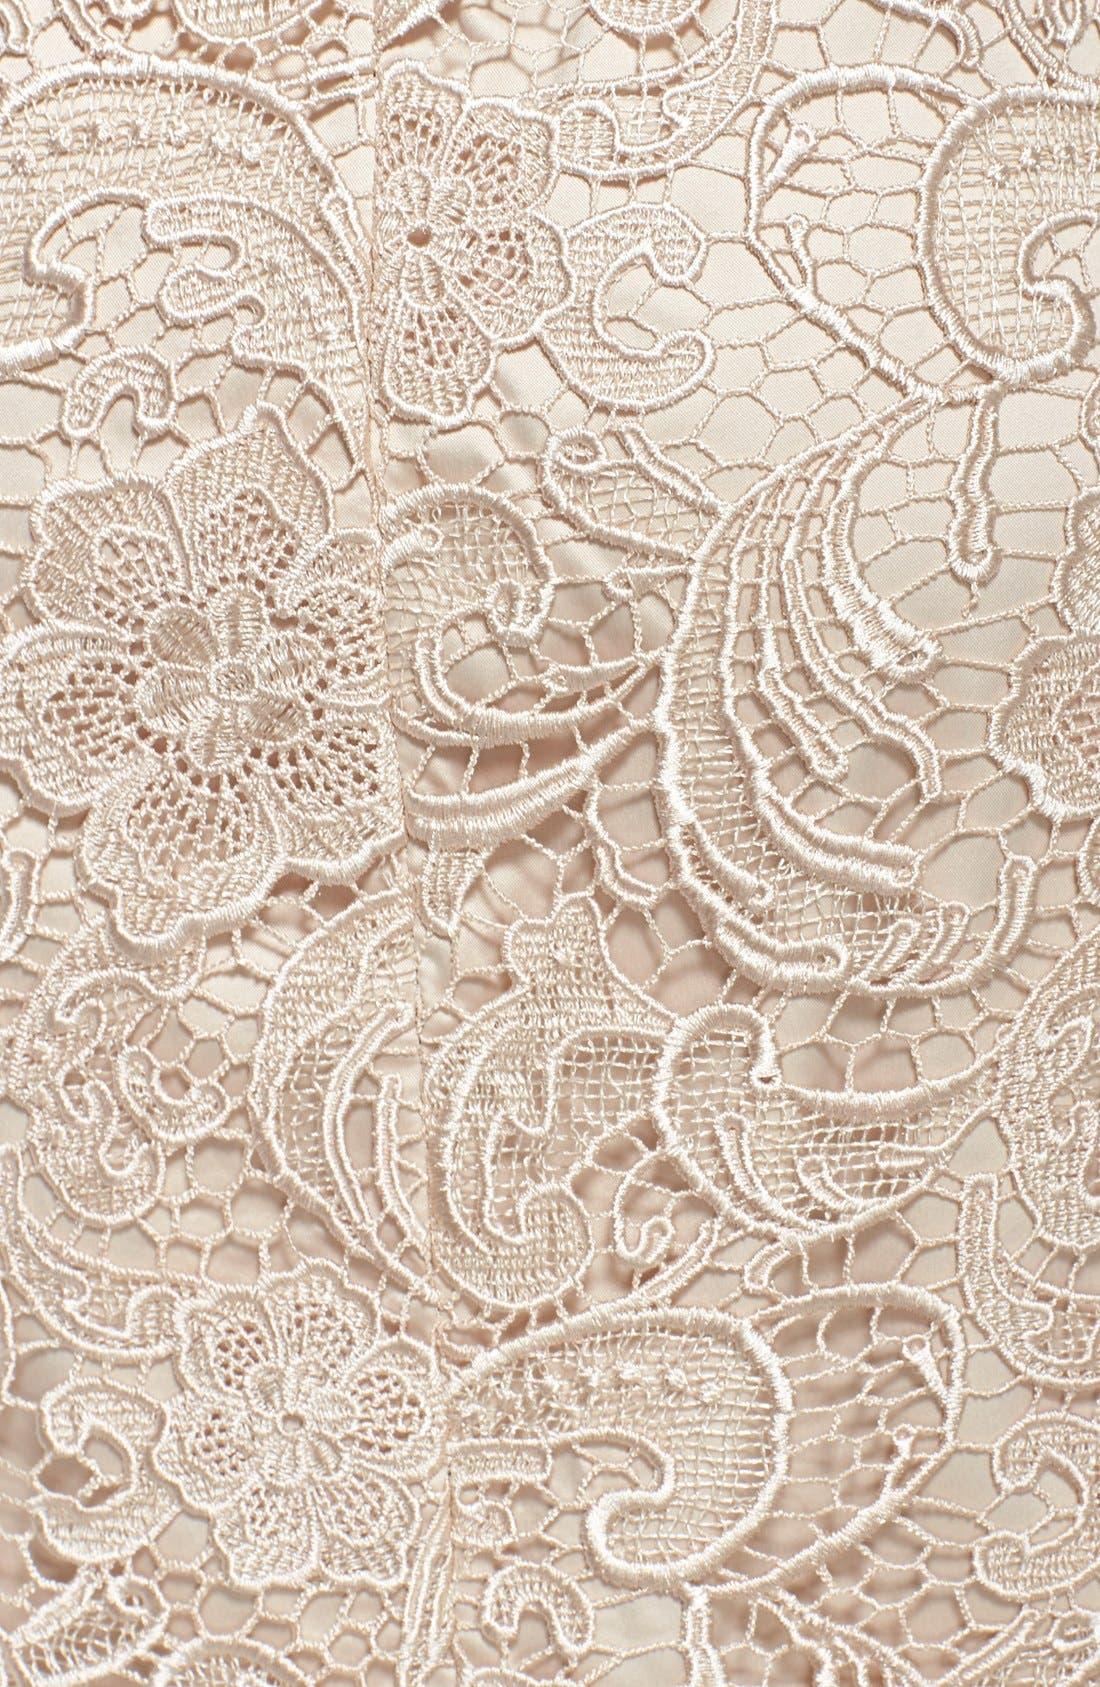 Illusion Bodice Lace Sheath Dress,                             Alternate thumbnail 25, color,